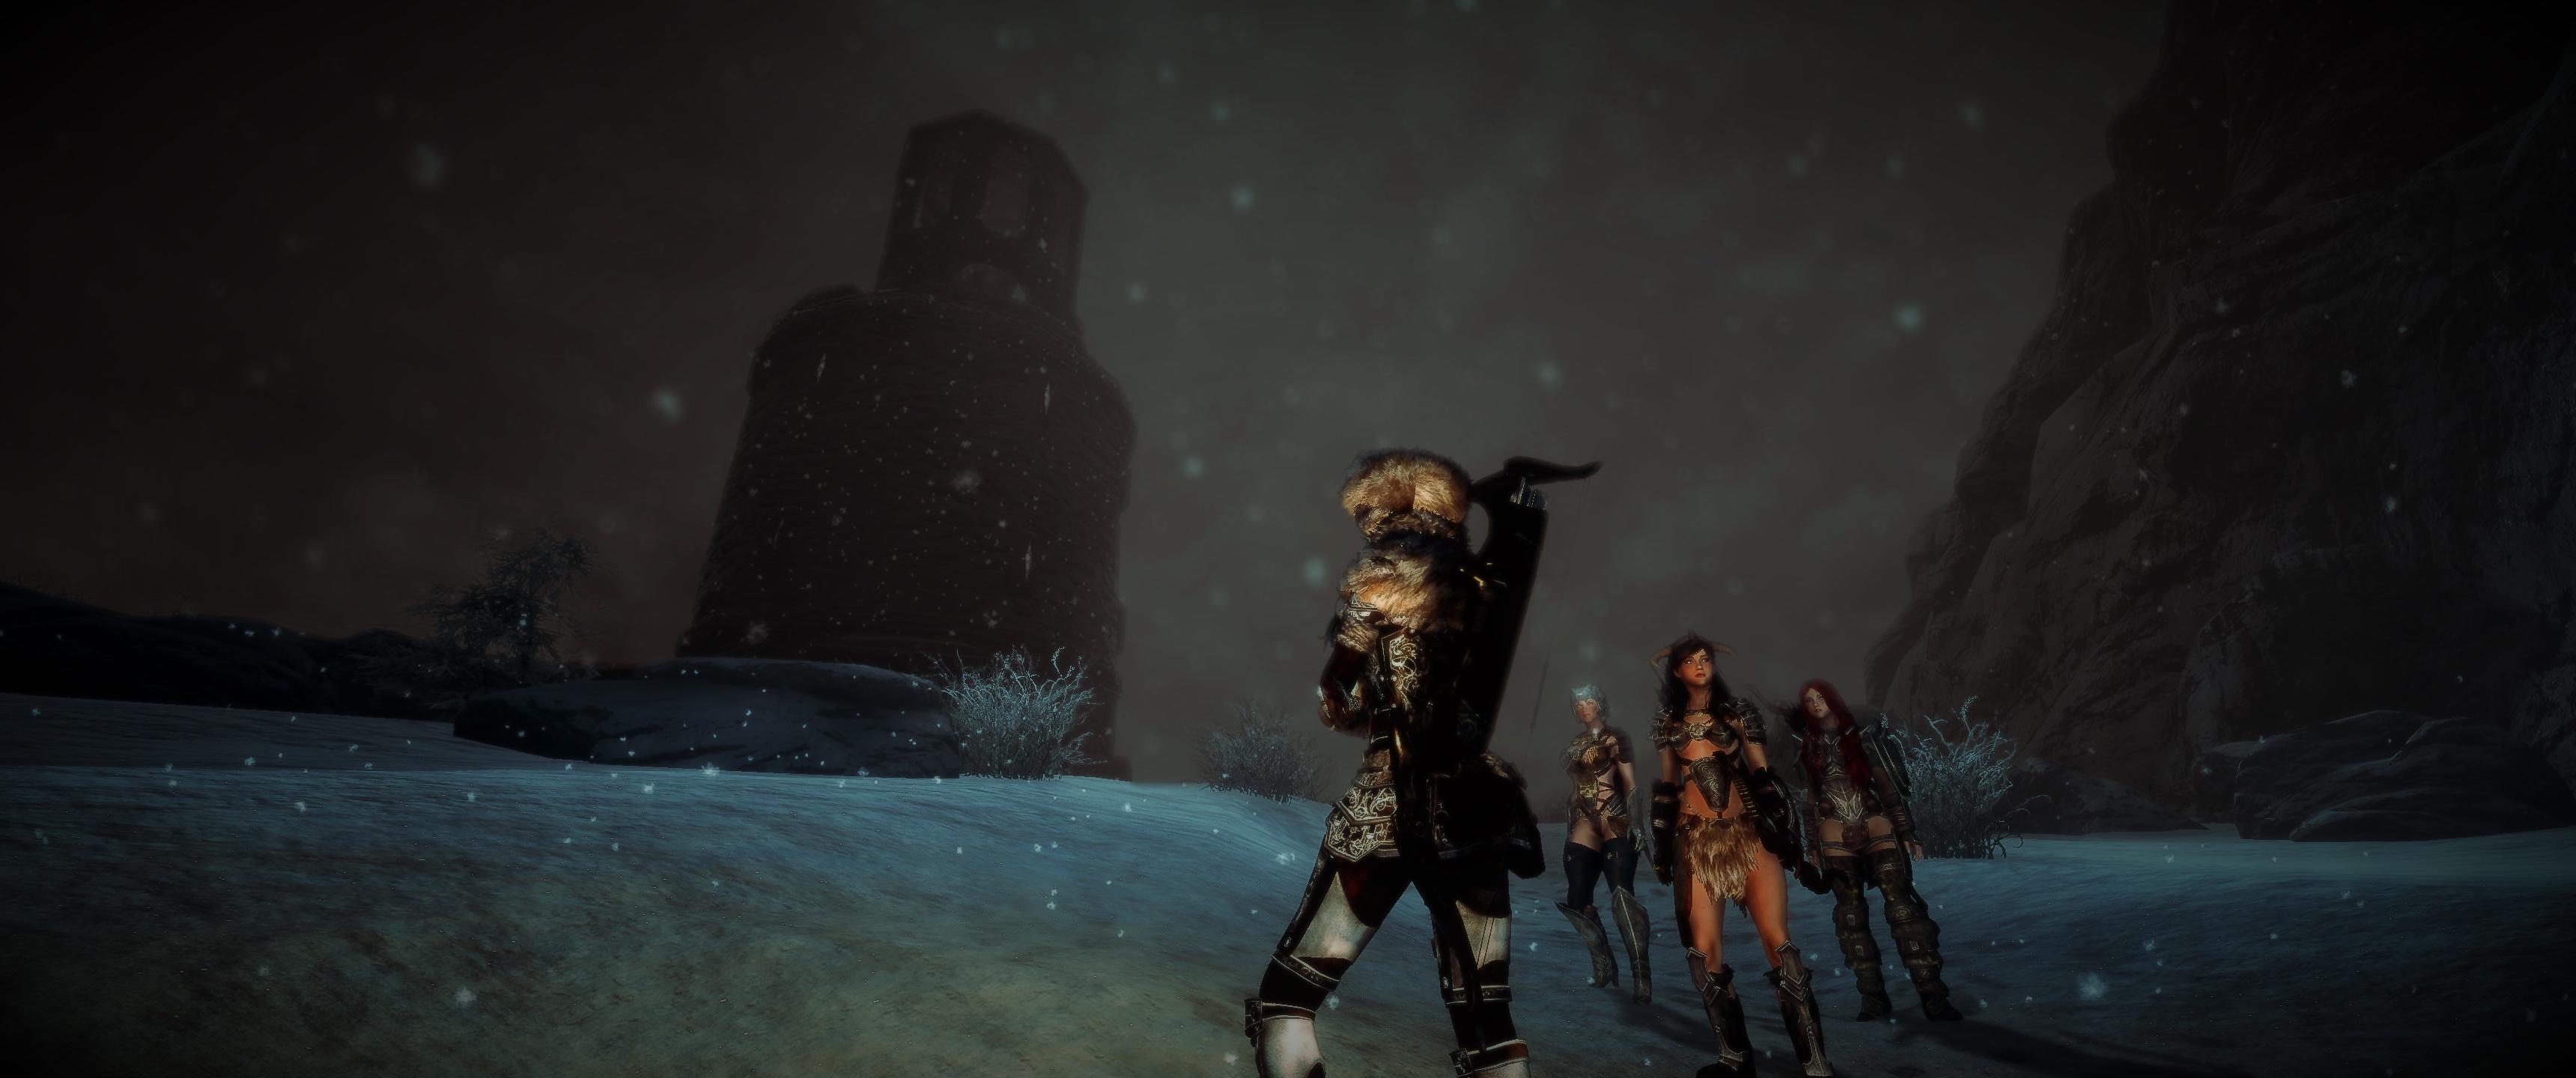 Skyrim SE New (19).jpg - Elder Scrolls 5: Skyrim, the